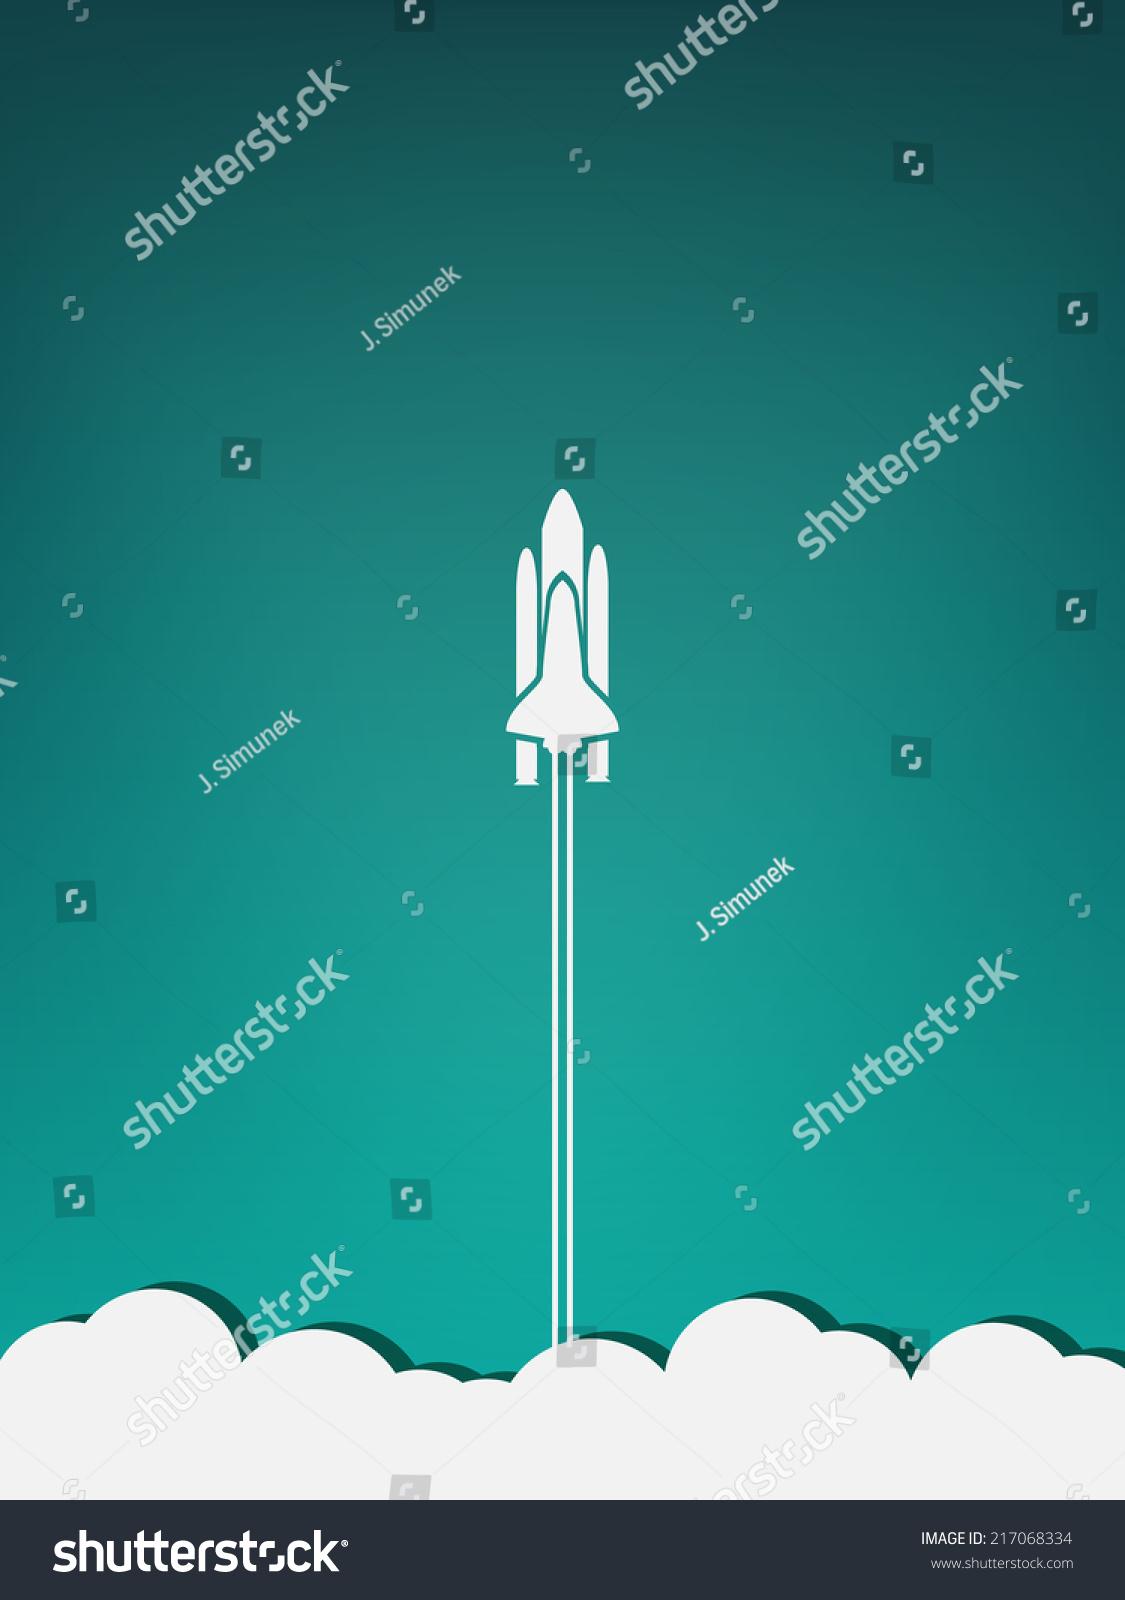 Spaceship Take Off Minimalist Poster Stock Vector ...